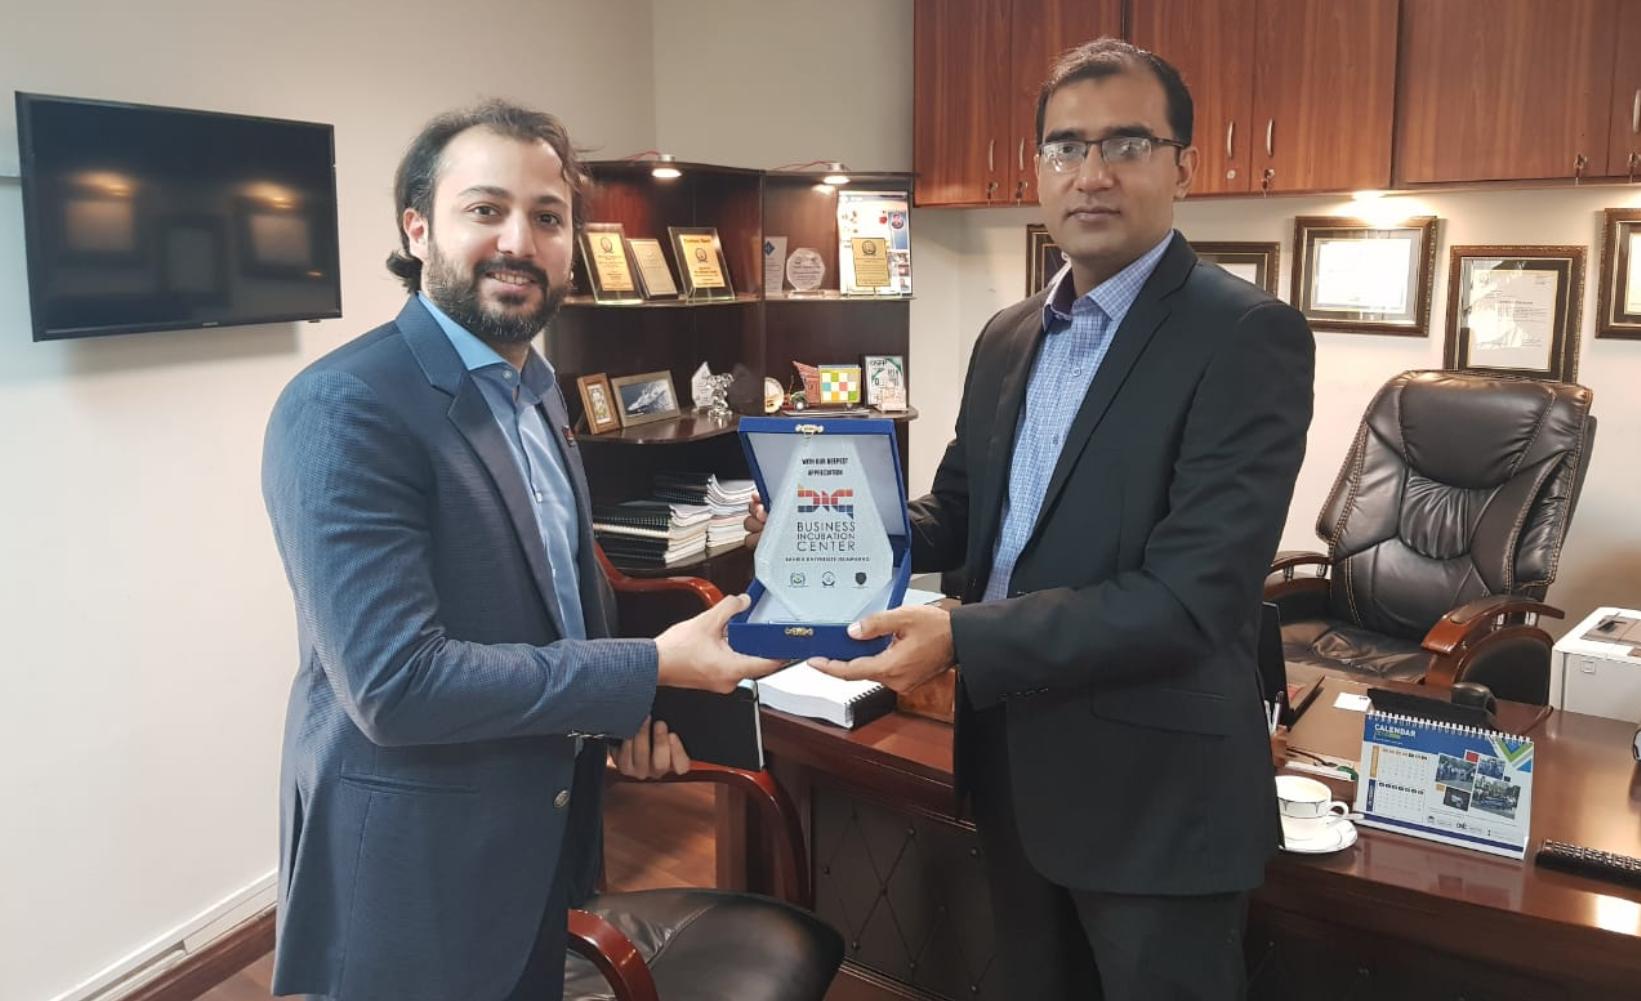 Prof Dr Shehzad Khalid Director Business Incubation Centre, Bahria University and Bilal Qureshi GSMA Ecsosystem Accelerator Market Engagement Manager